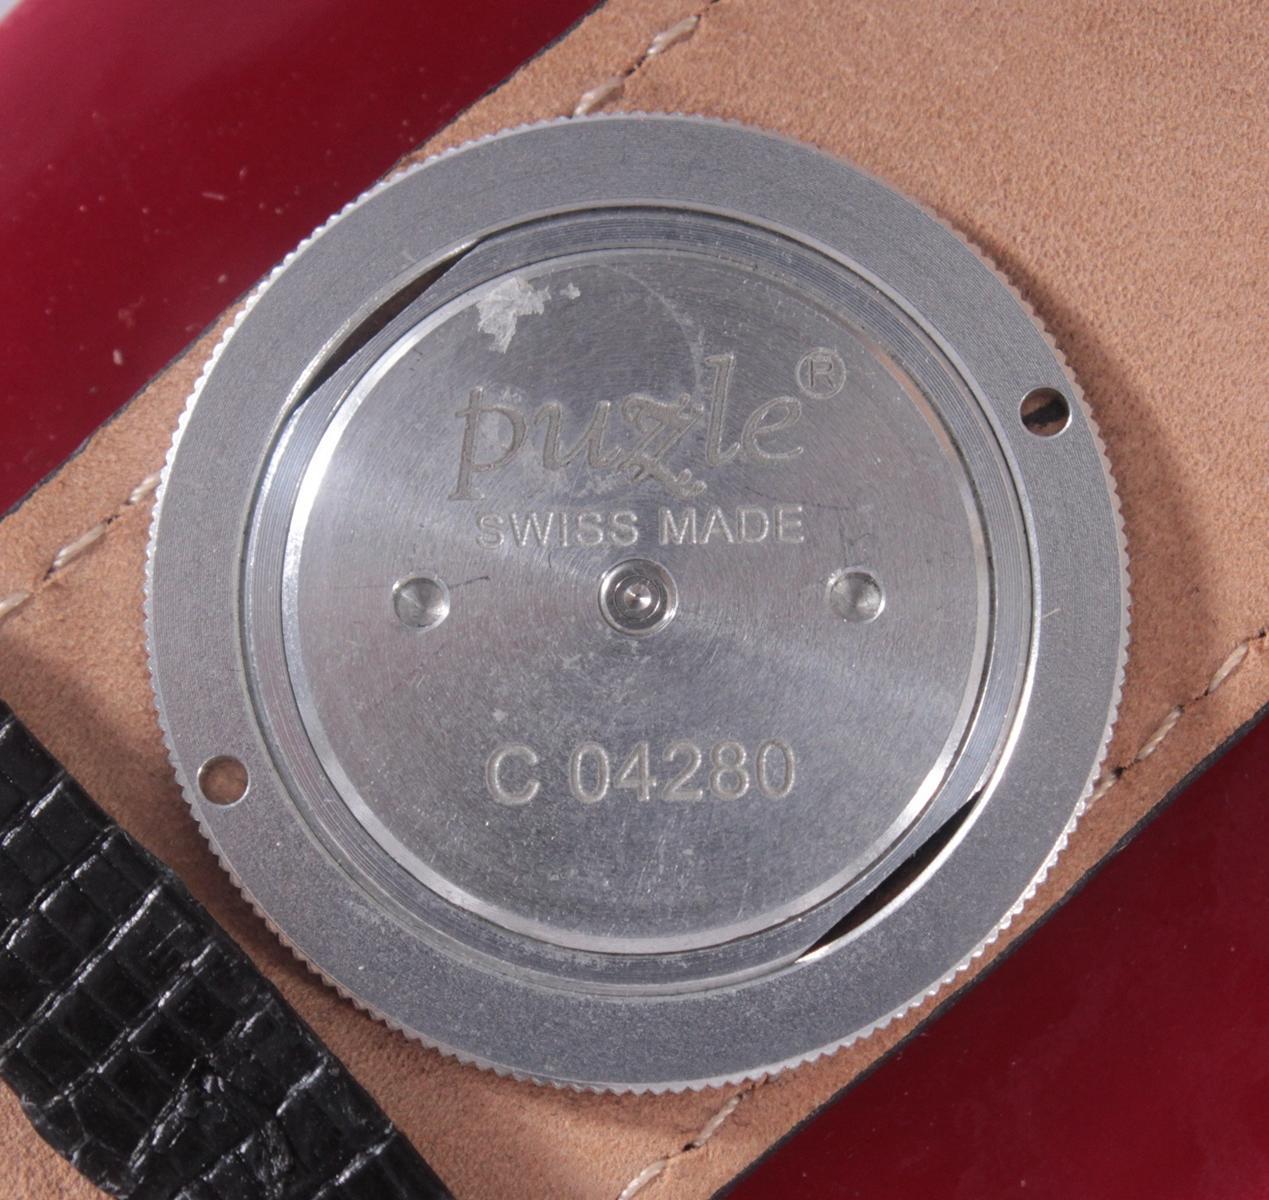 Damenarmbanduhr der Marke Puzle-4